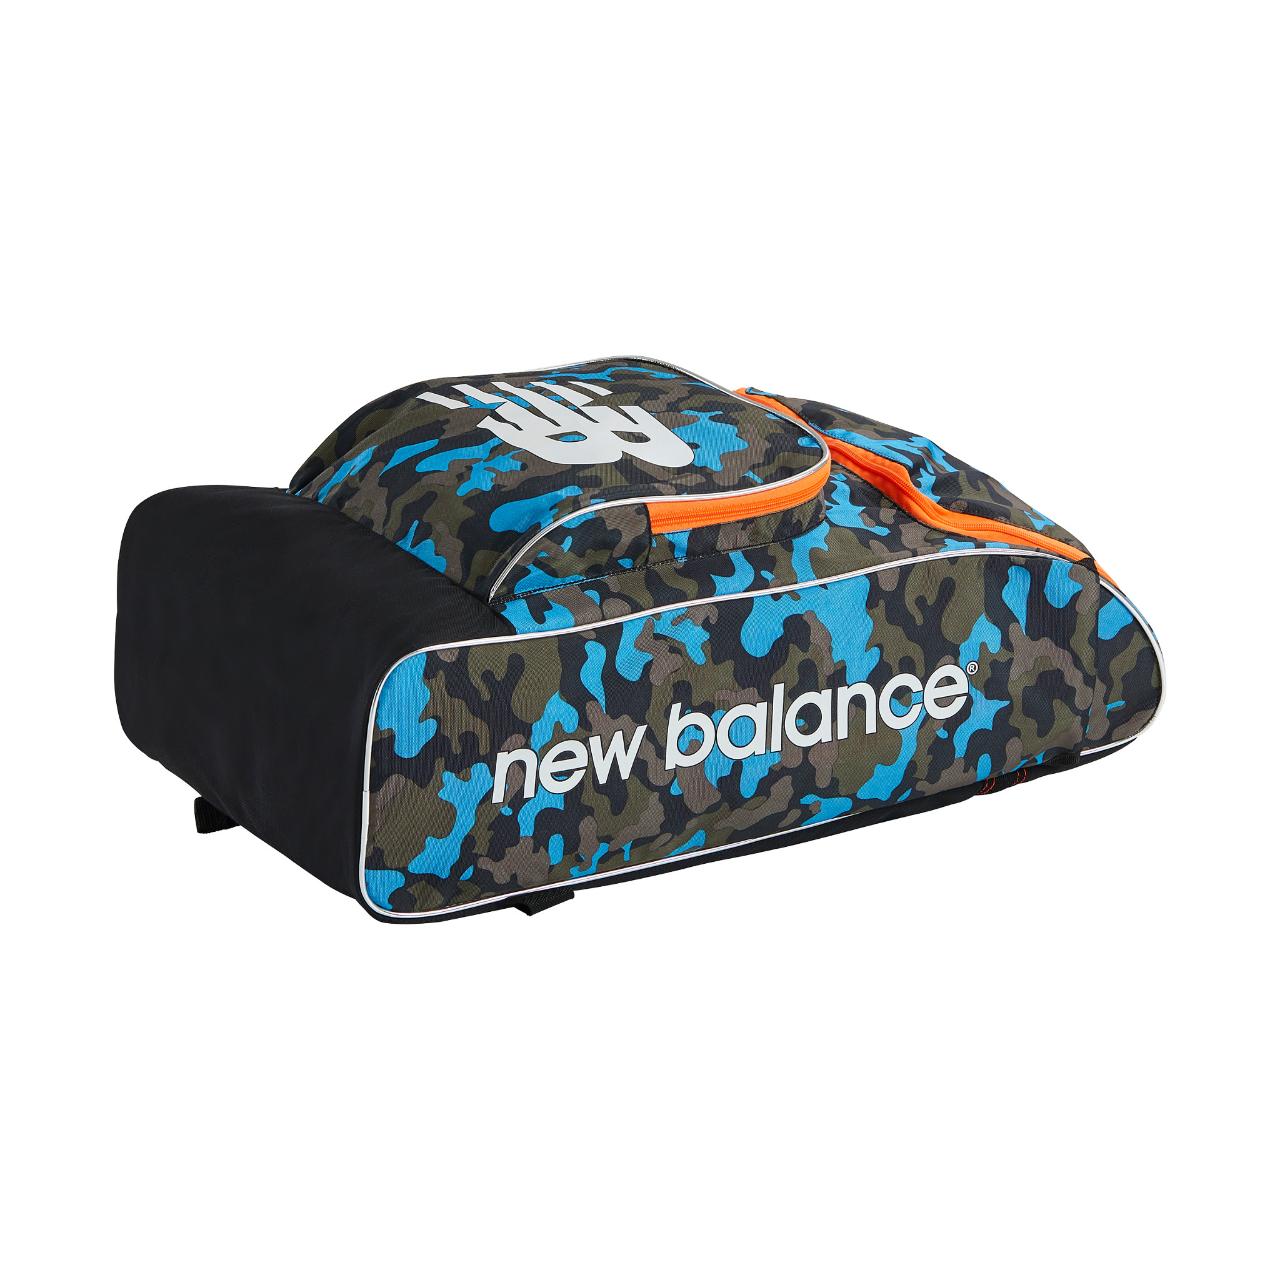 2019 New Balance Burn 570 Duffle Cricket Bag